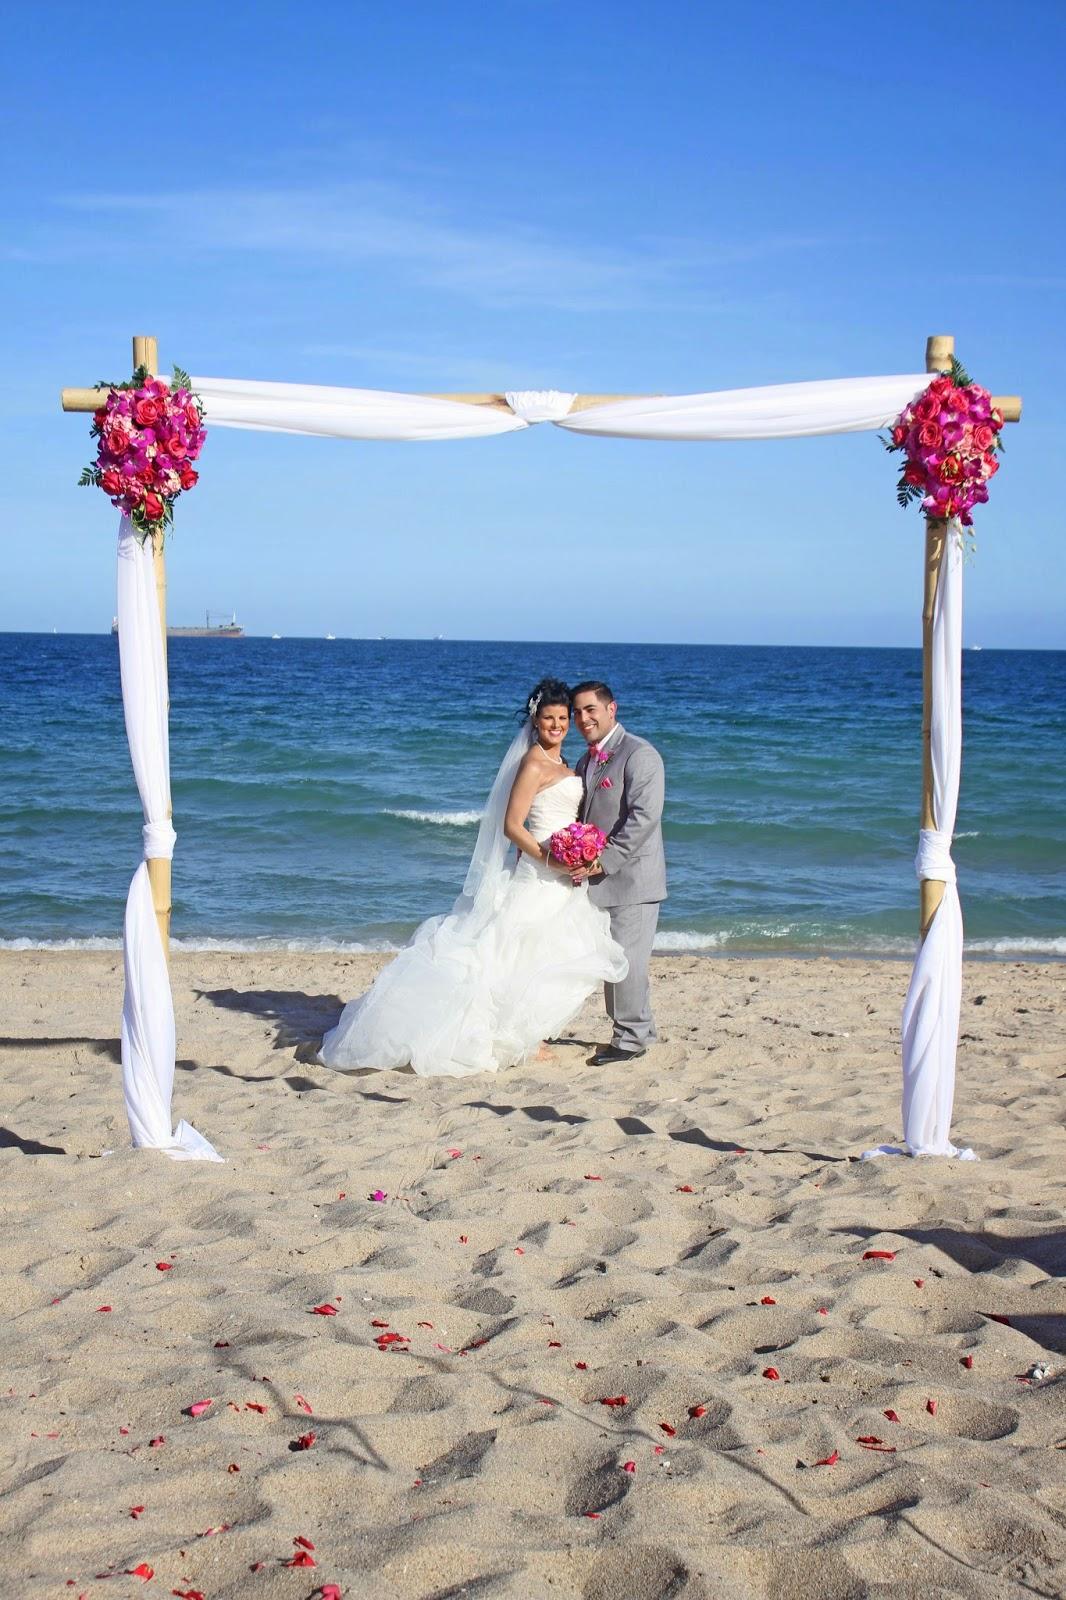 Affordable Beach Weddings 3057934387 GINETTE  HUBERTO  FT LAUDERDALE BEACH WEDDING